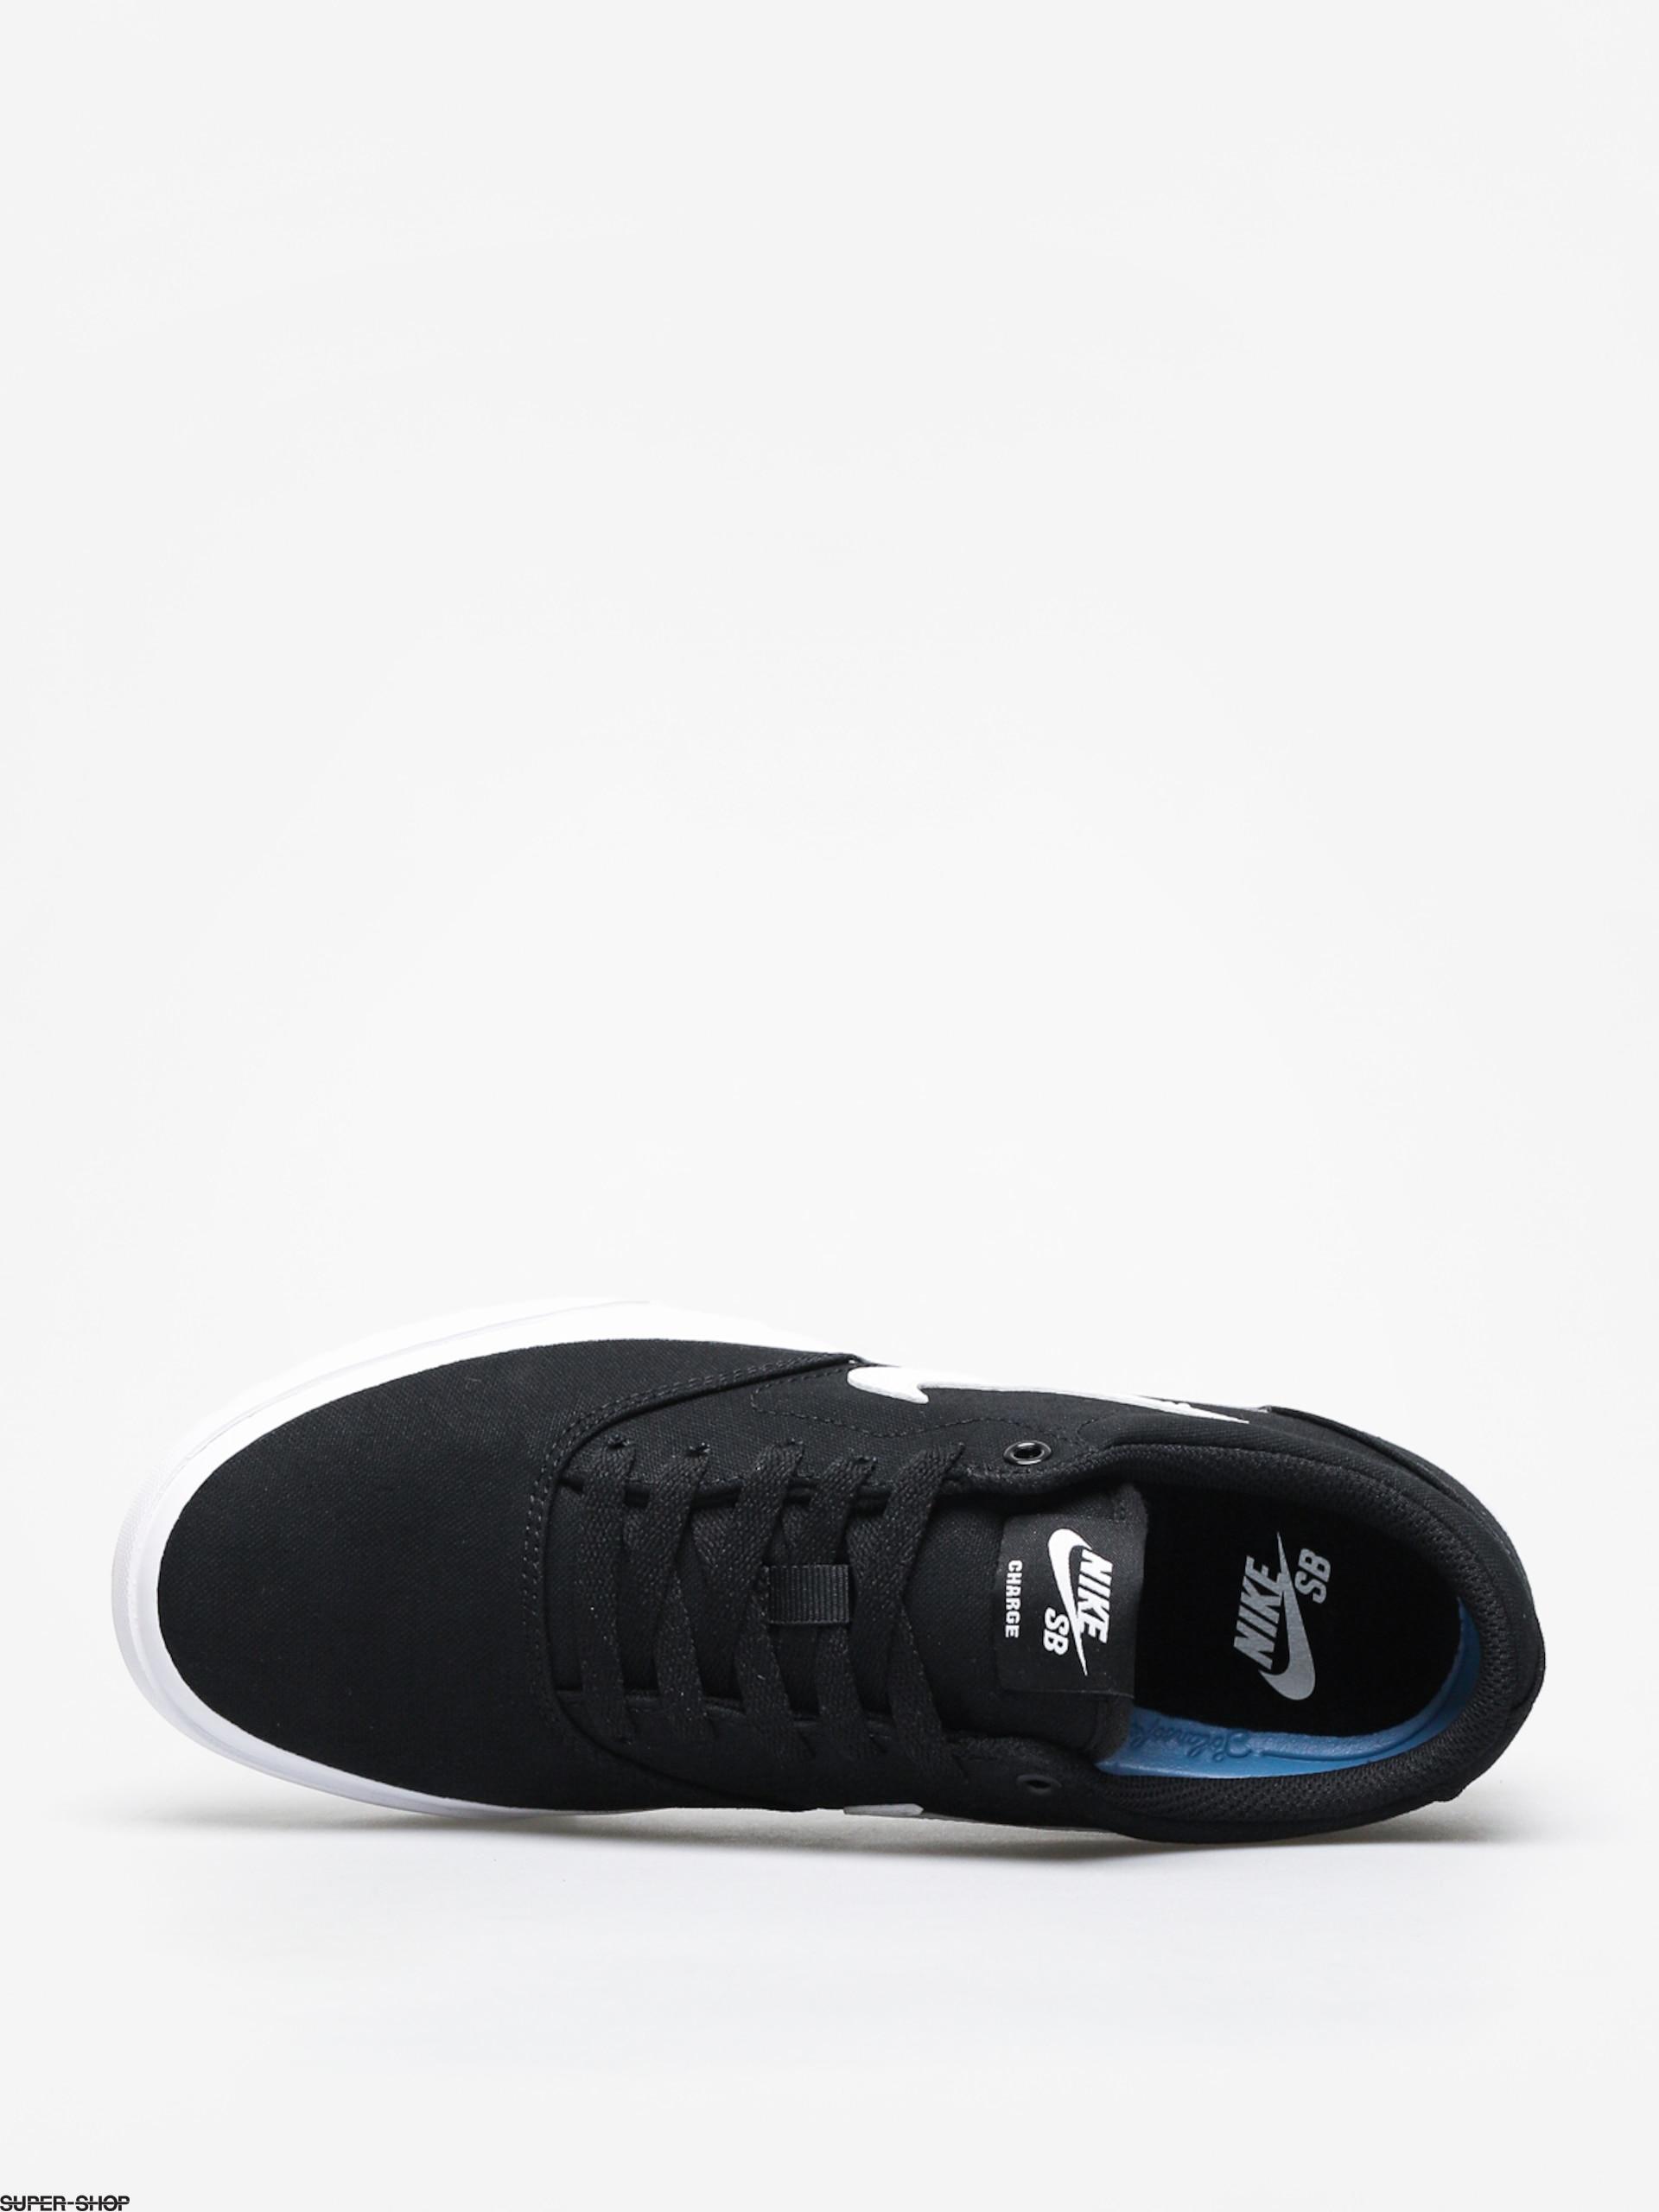 8ac7f7941 Nike SB Charge Slr Shoes (black white)